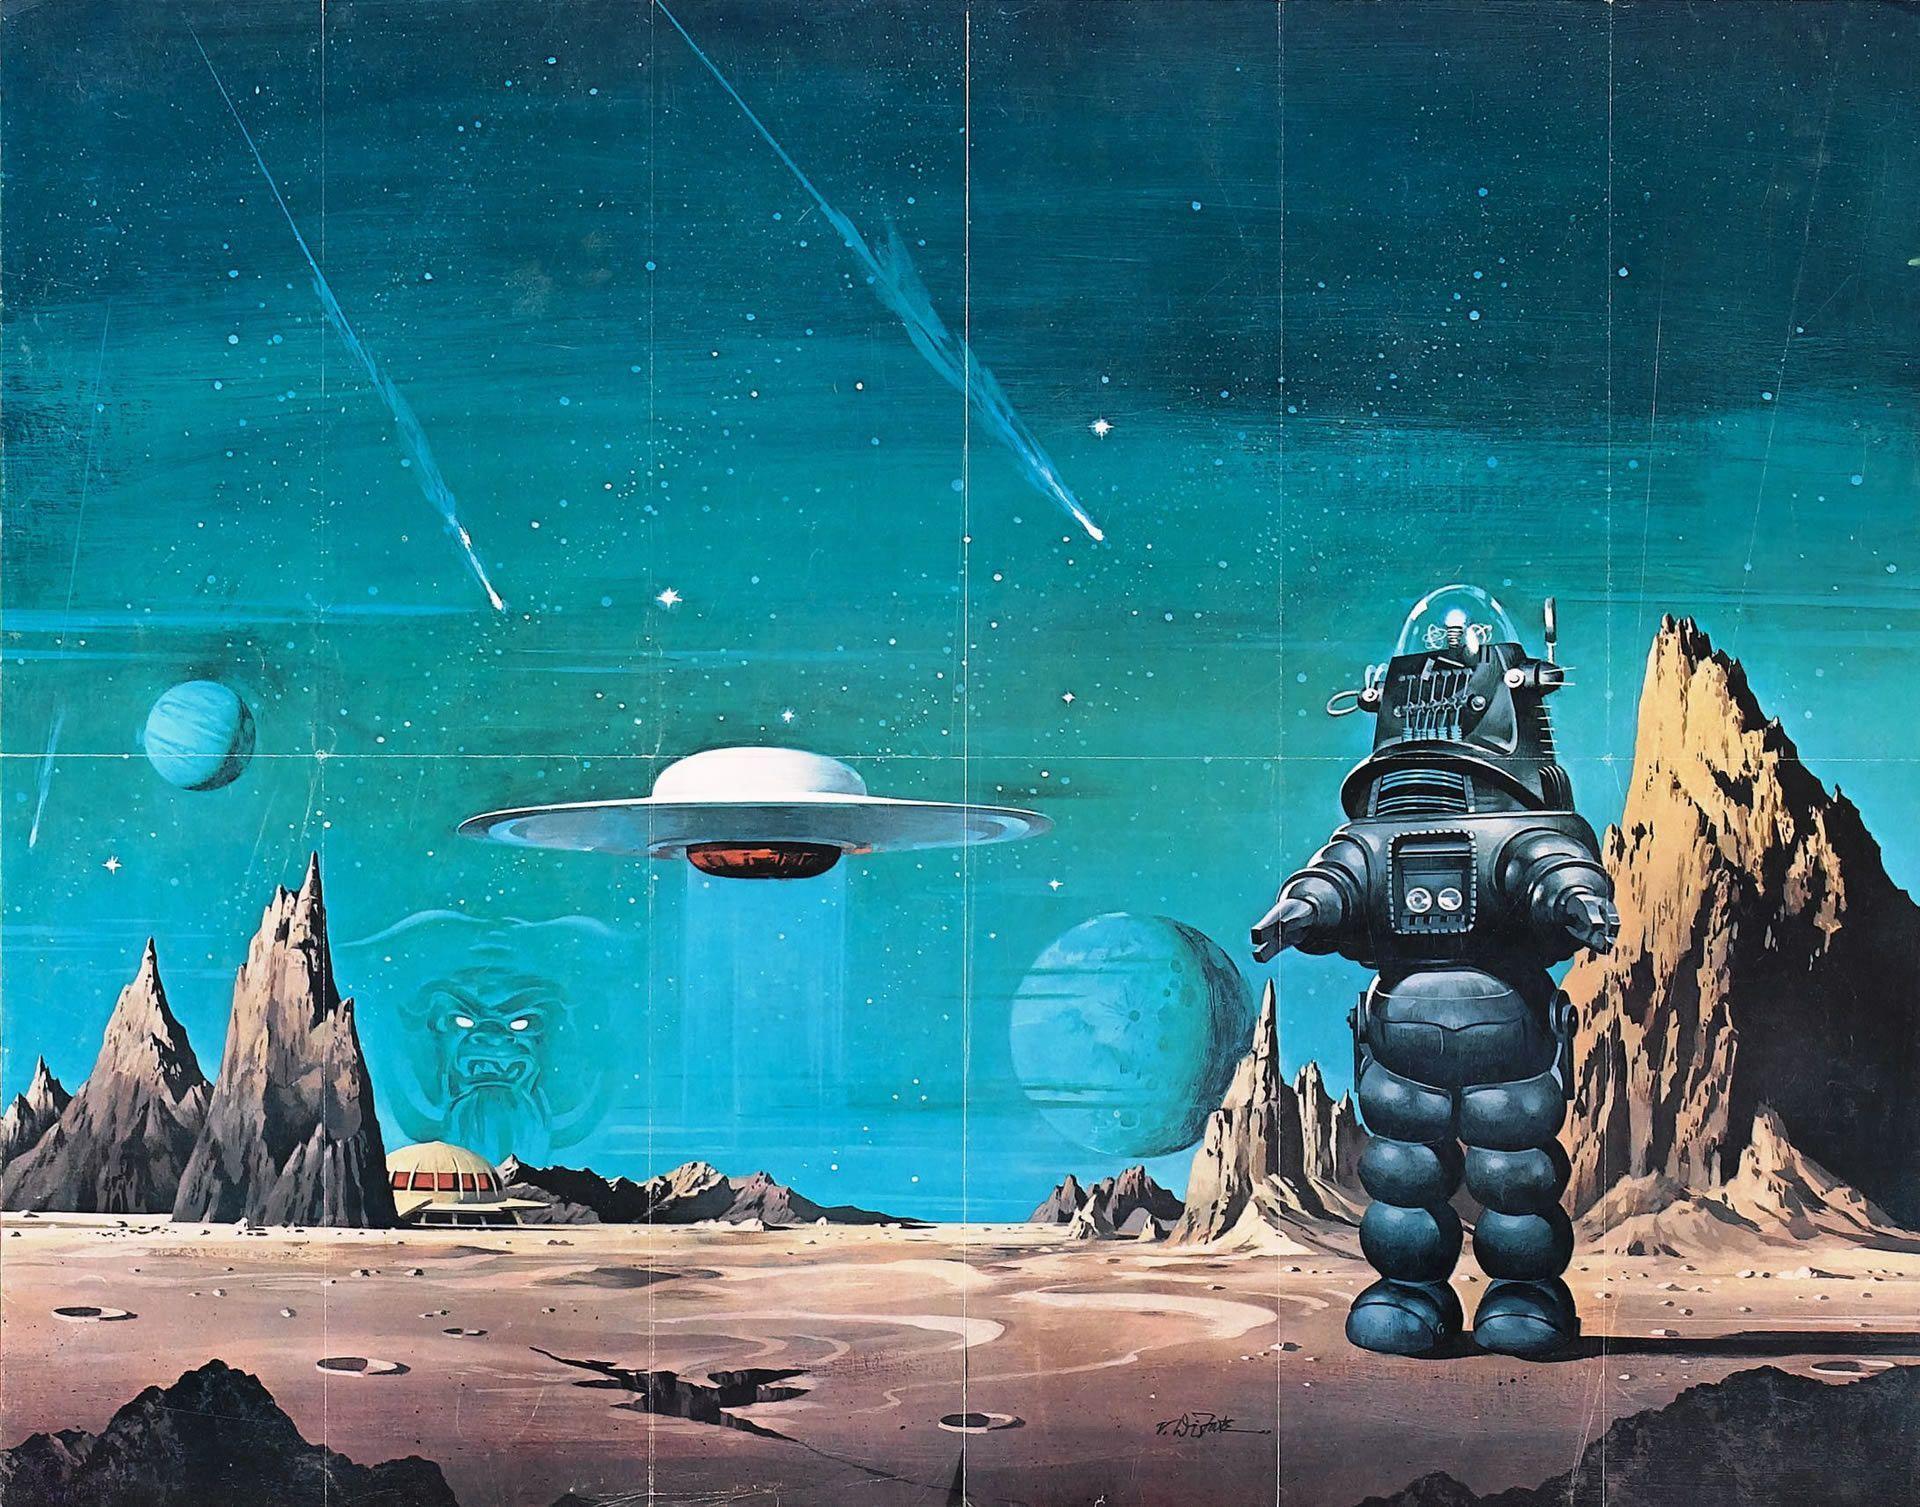 Vintage Sci Fi Robot Wallpapers Top Free Vintage Sci Fi Robot Backgrounds Wallpaperaccess